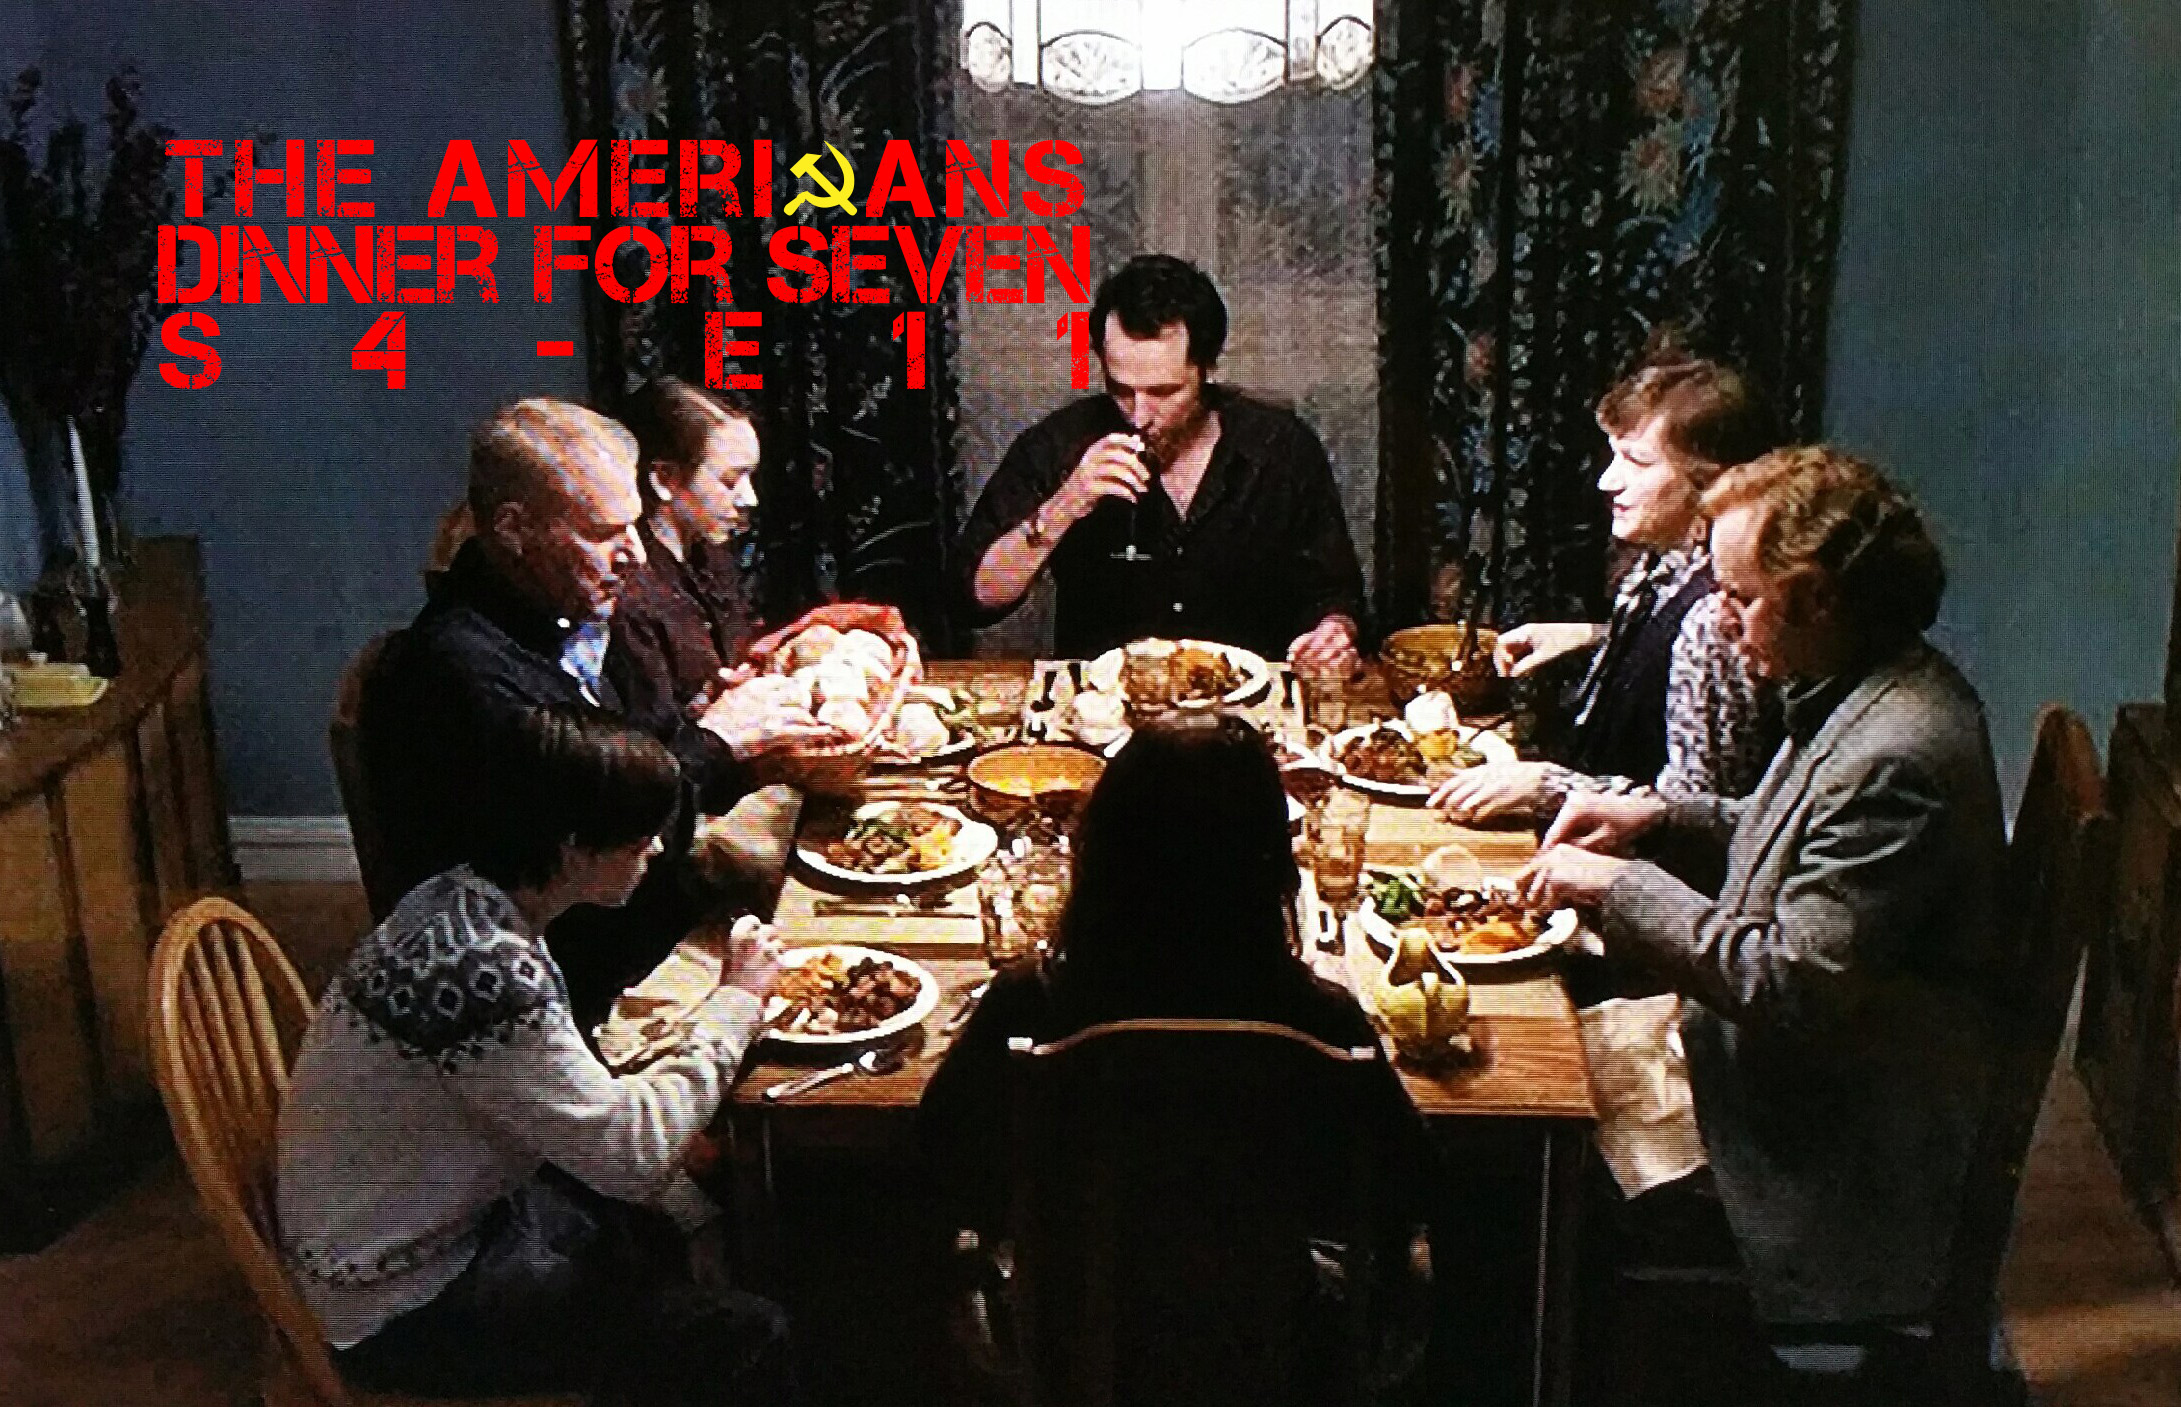 The Americans: Dinner For Seven | S4-E11